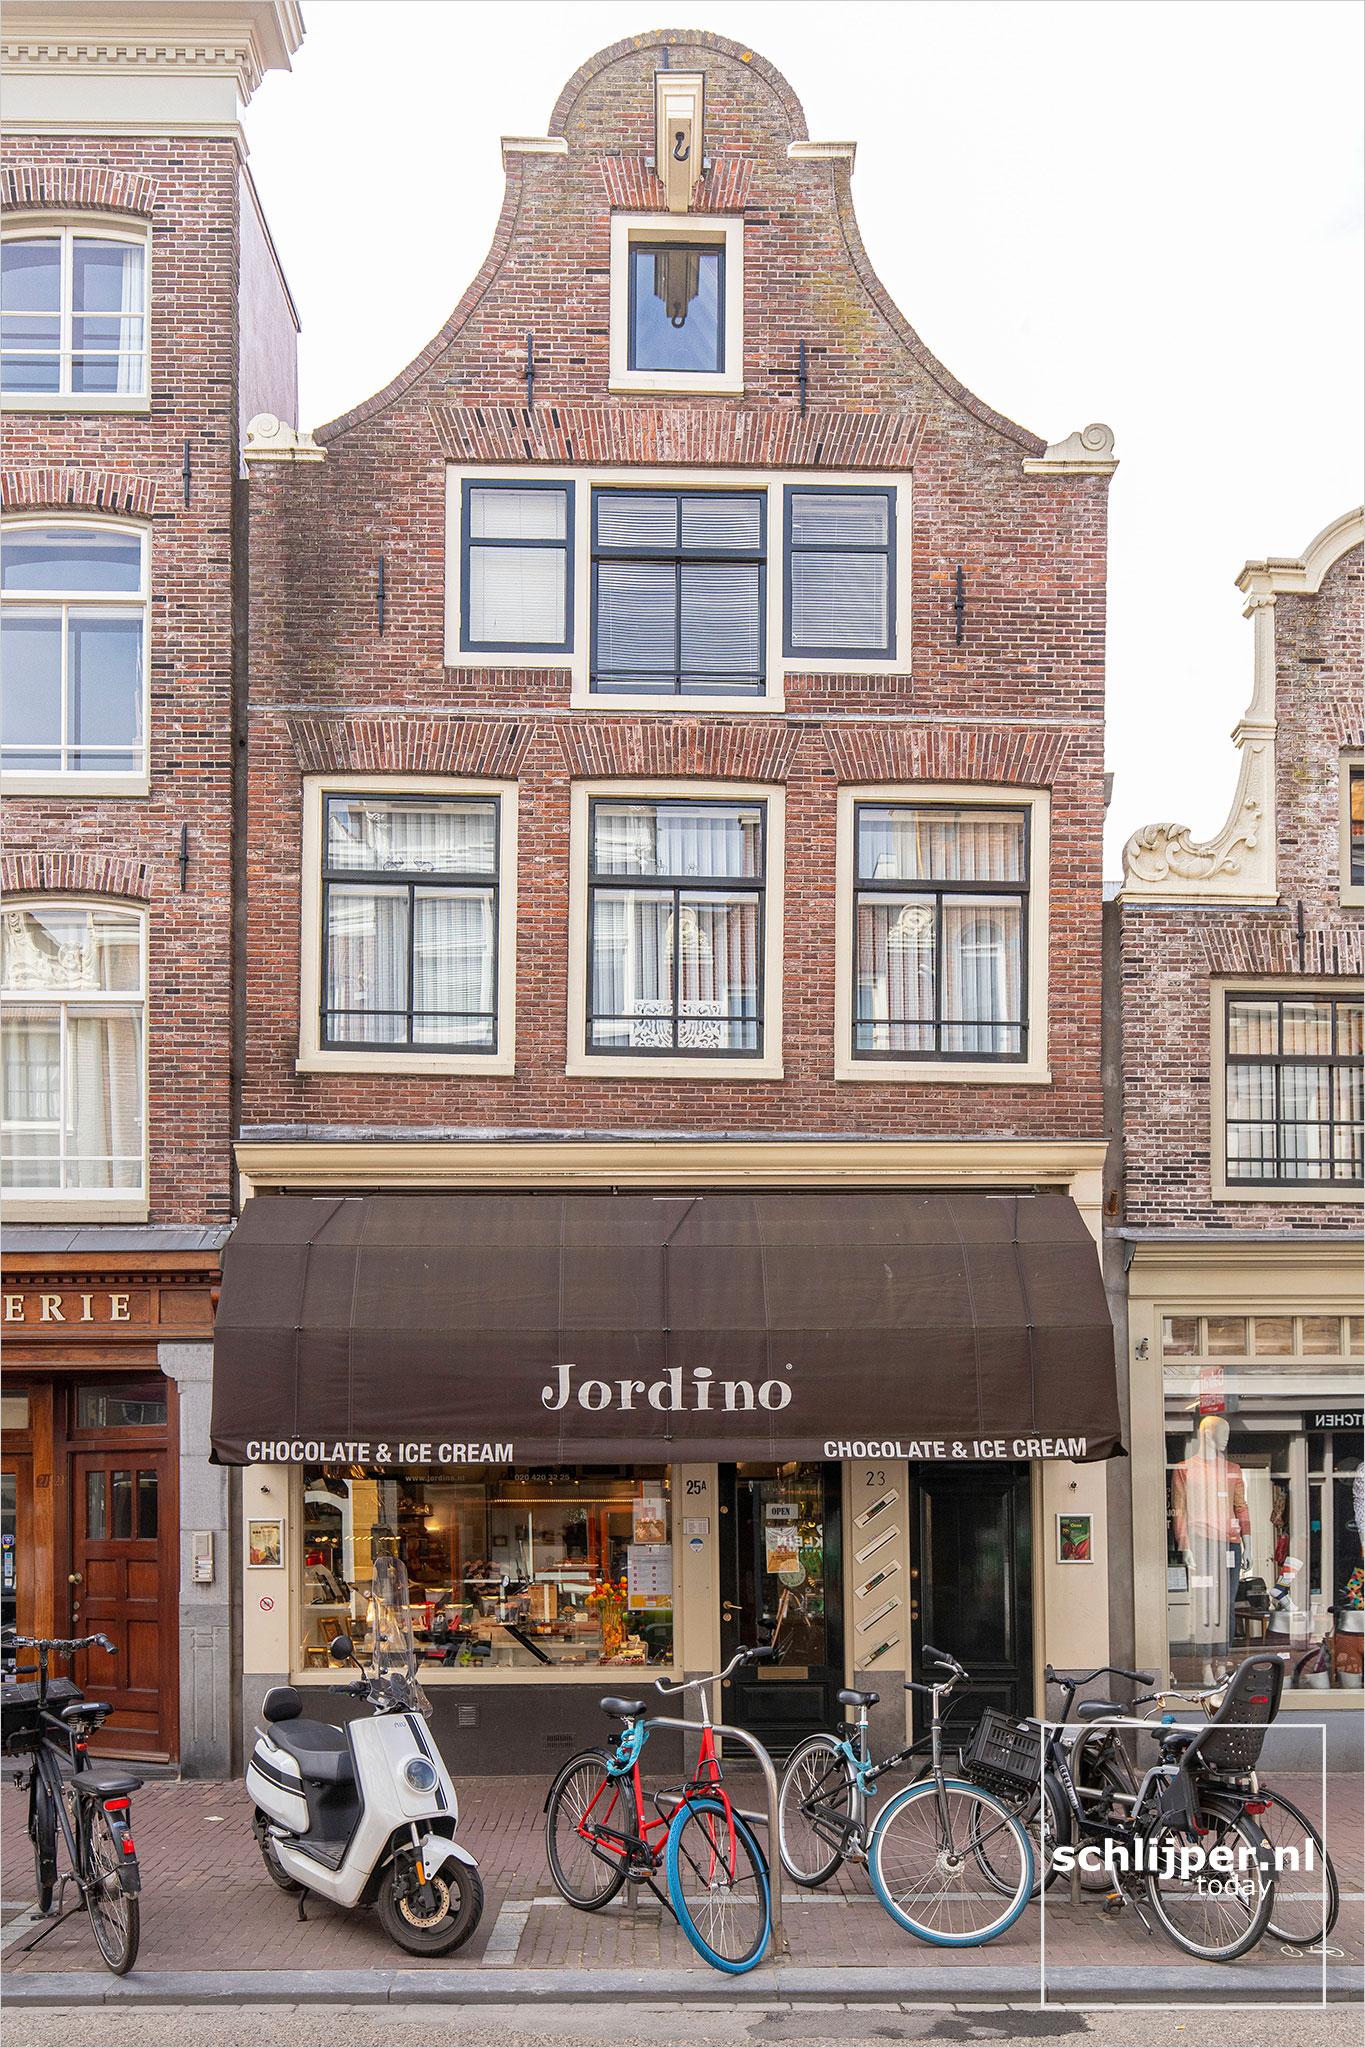 The Netherlands, Amsterdam, 8 april 2021